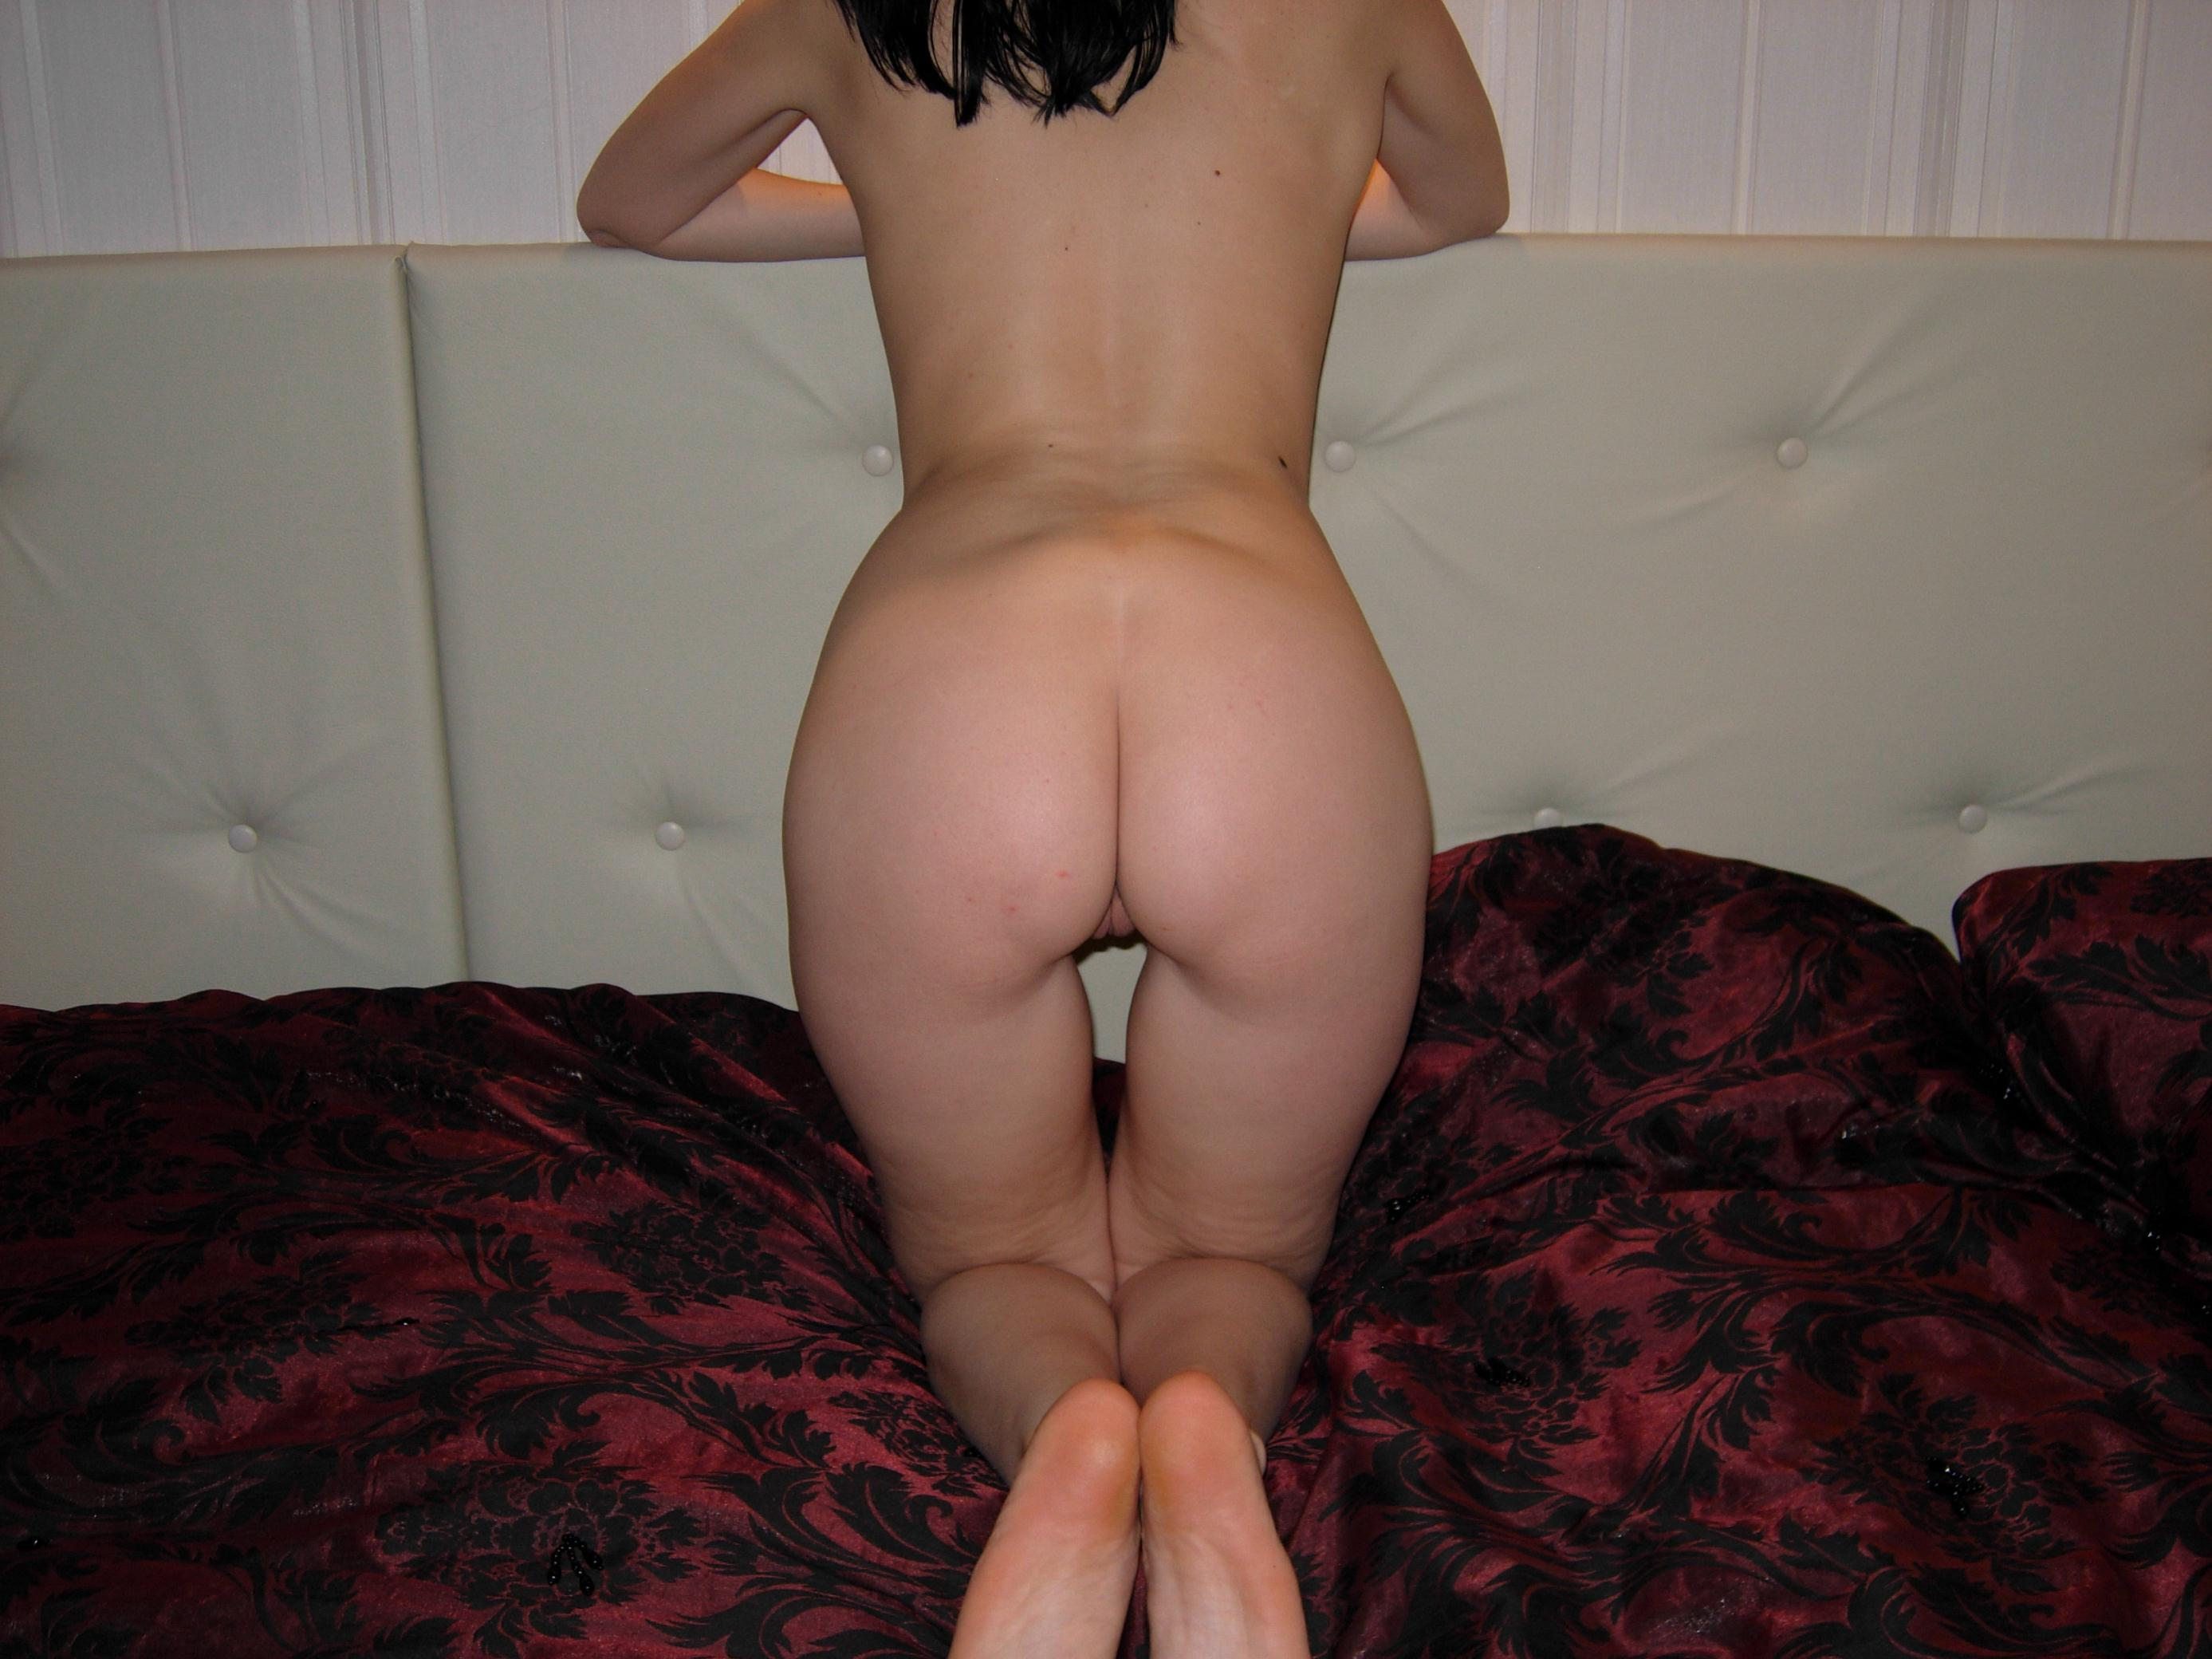 amateur-nude-brunette-bedroom-31